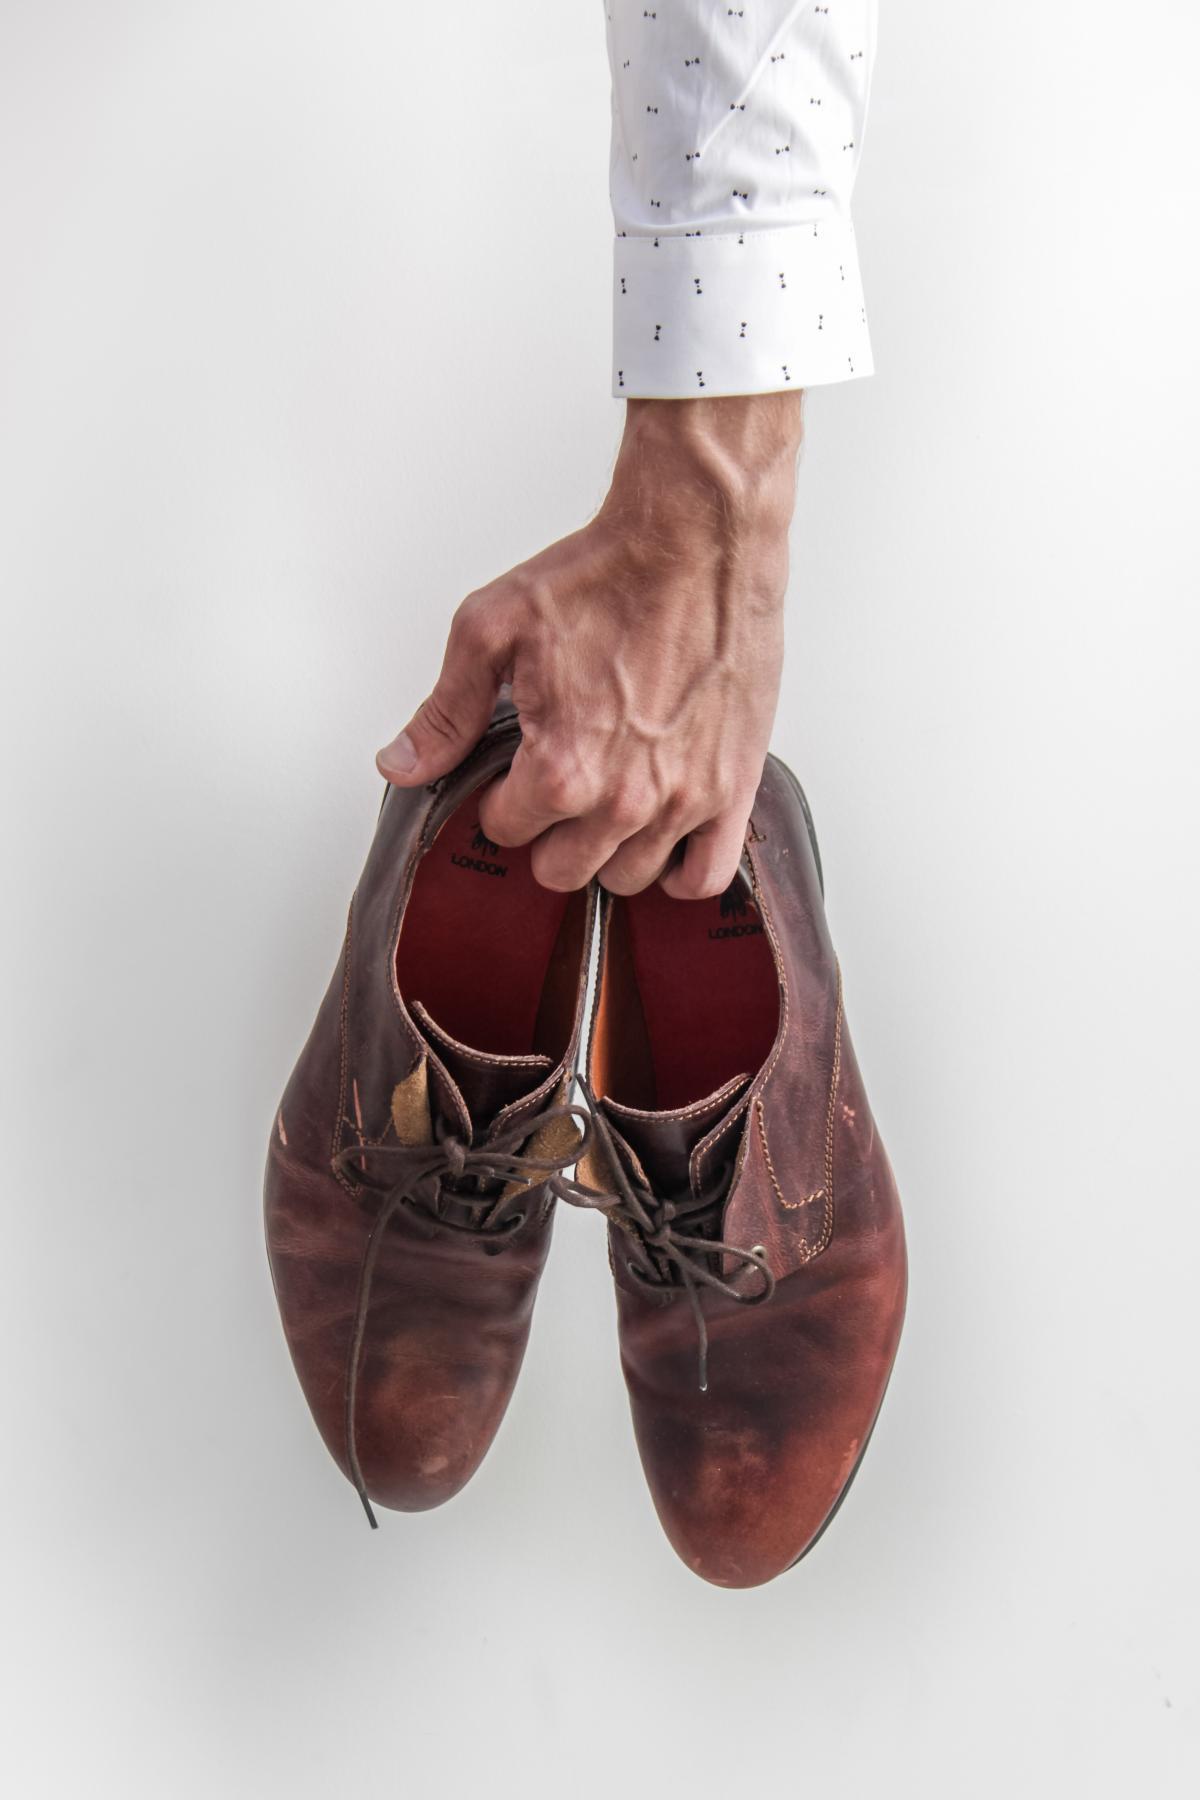 Man Holding Shoes Free Photo #401424